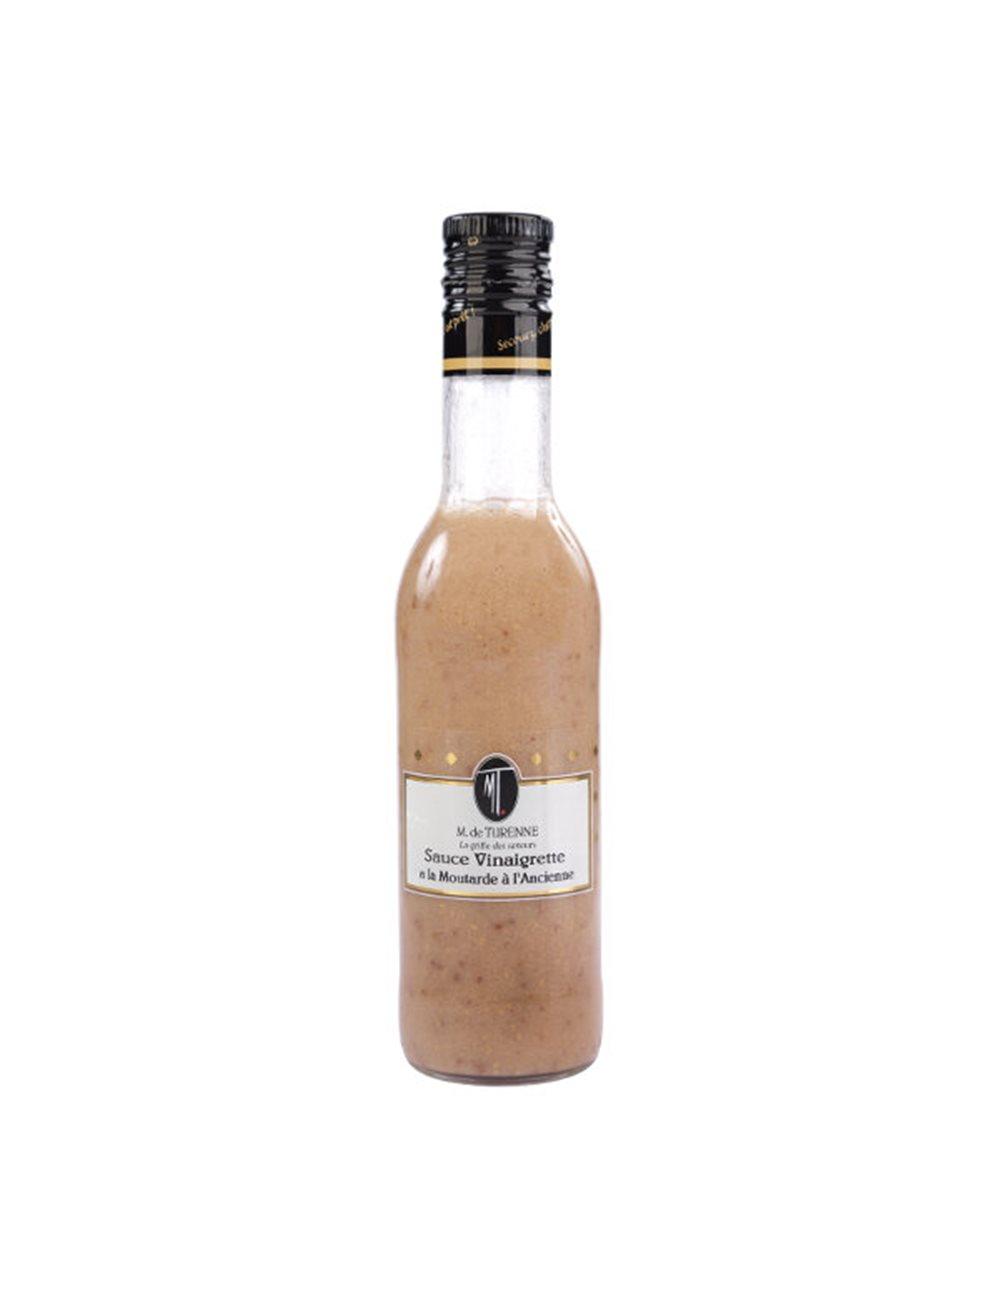 Vinaigrette A La Moutarde A L'Ancienne 375ml